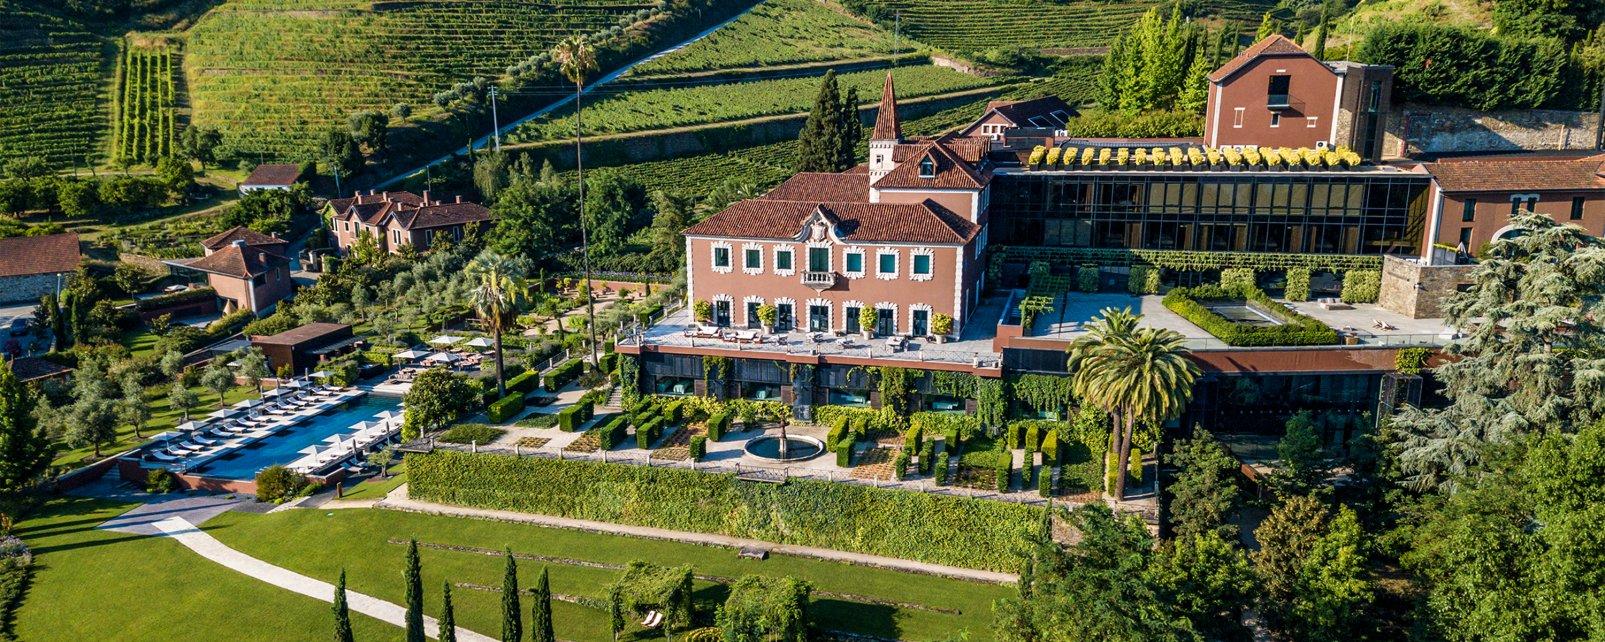 Hôtel Six Senses Duro Valley